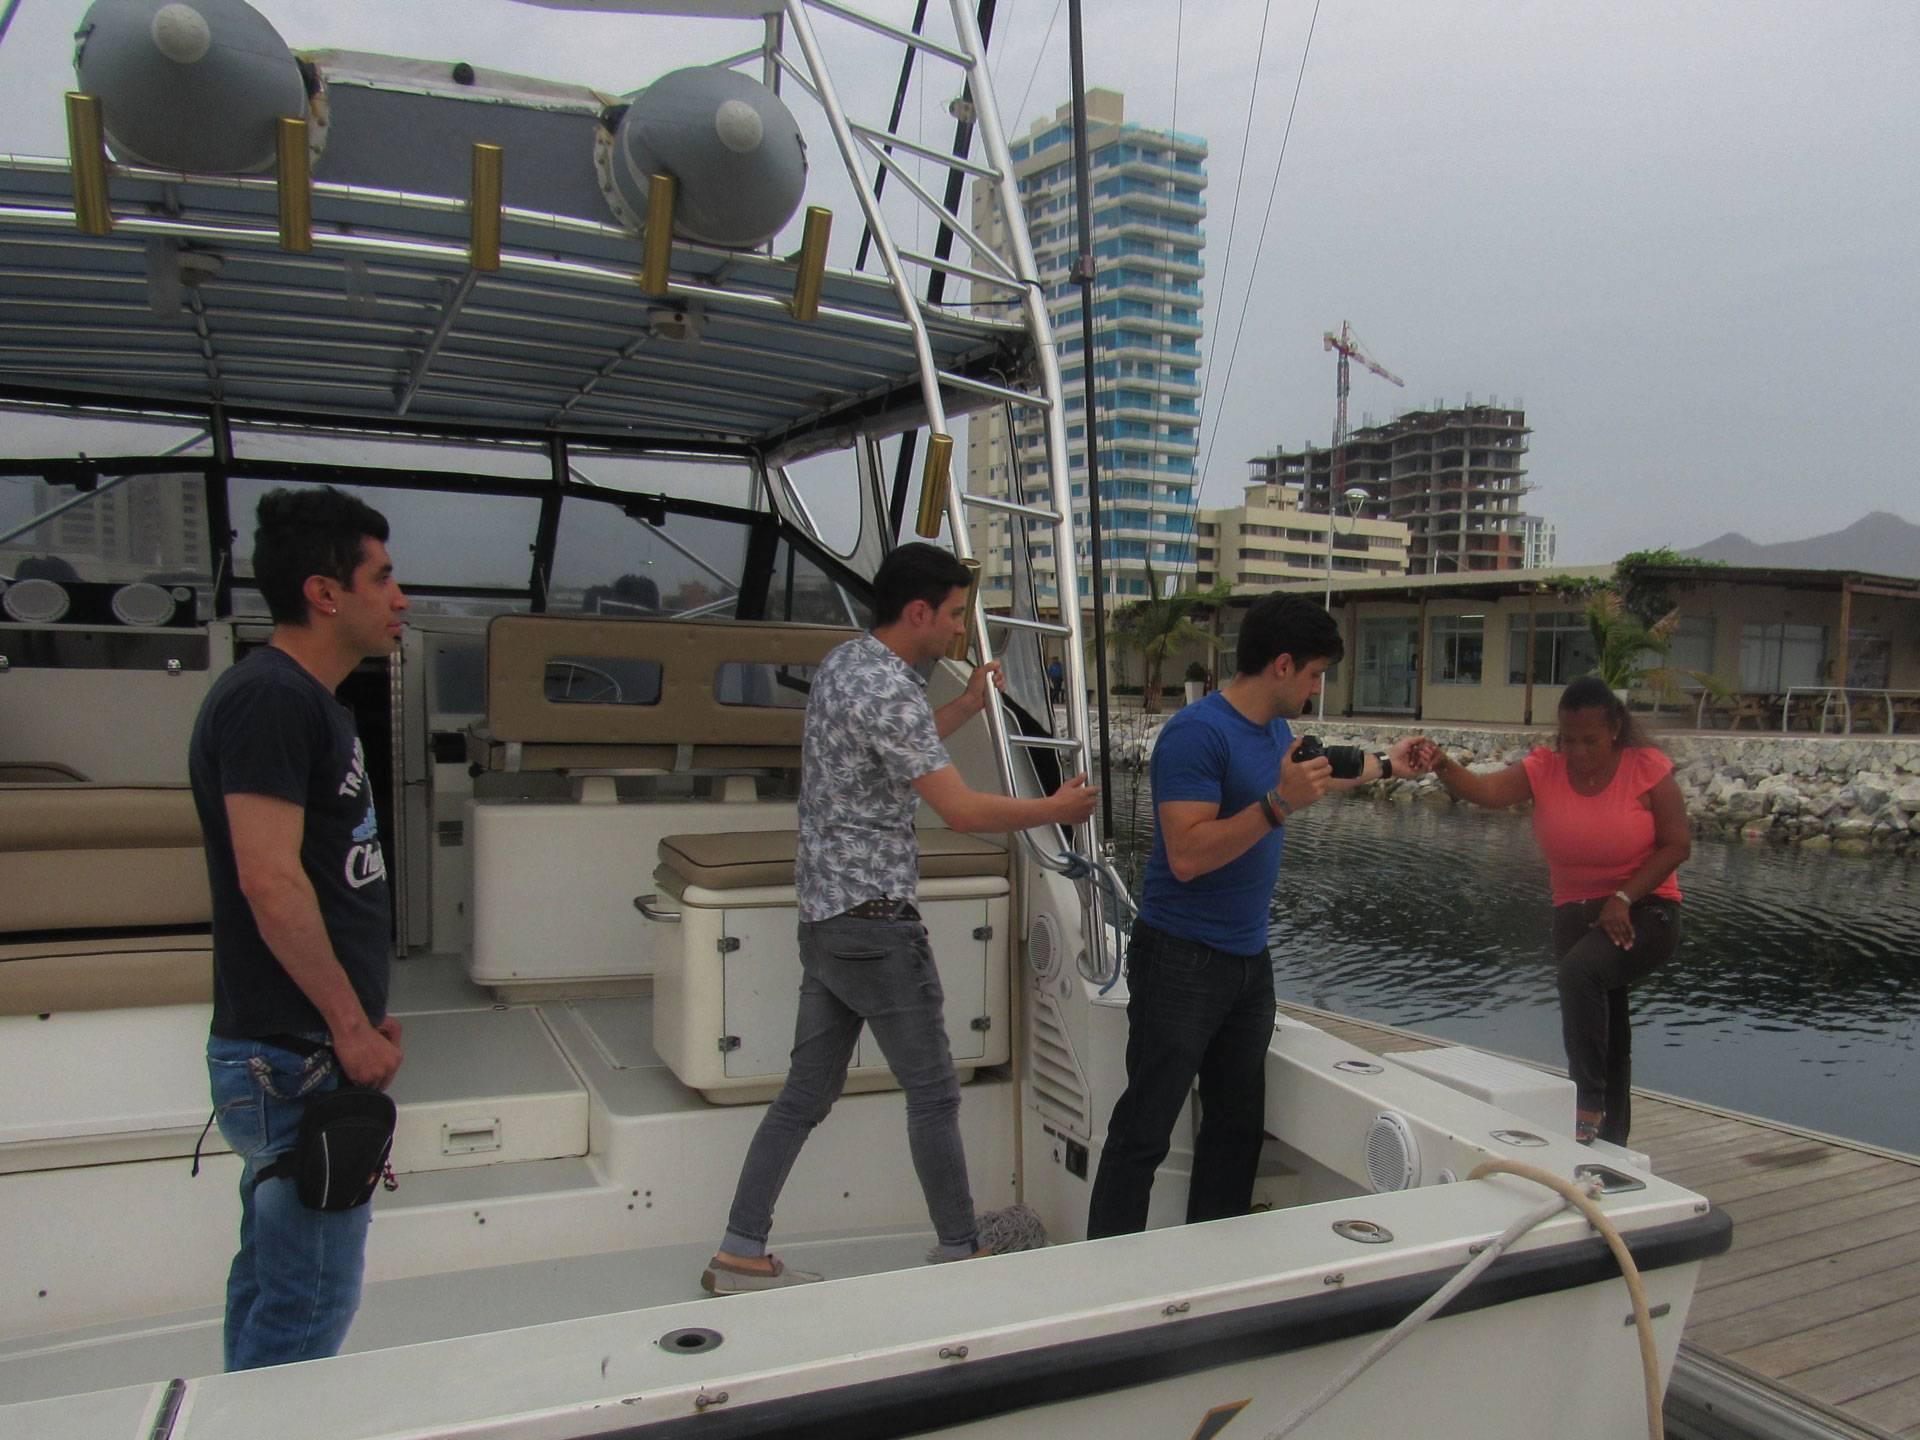 mgid:file:gsp:scenic:/international/mtvla.com/catfish-colombia/temporada-2/fotogalerias/episodio-202/CATFISHCO_EPISODIO_202_14.jpg